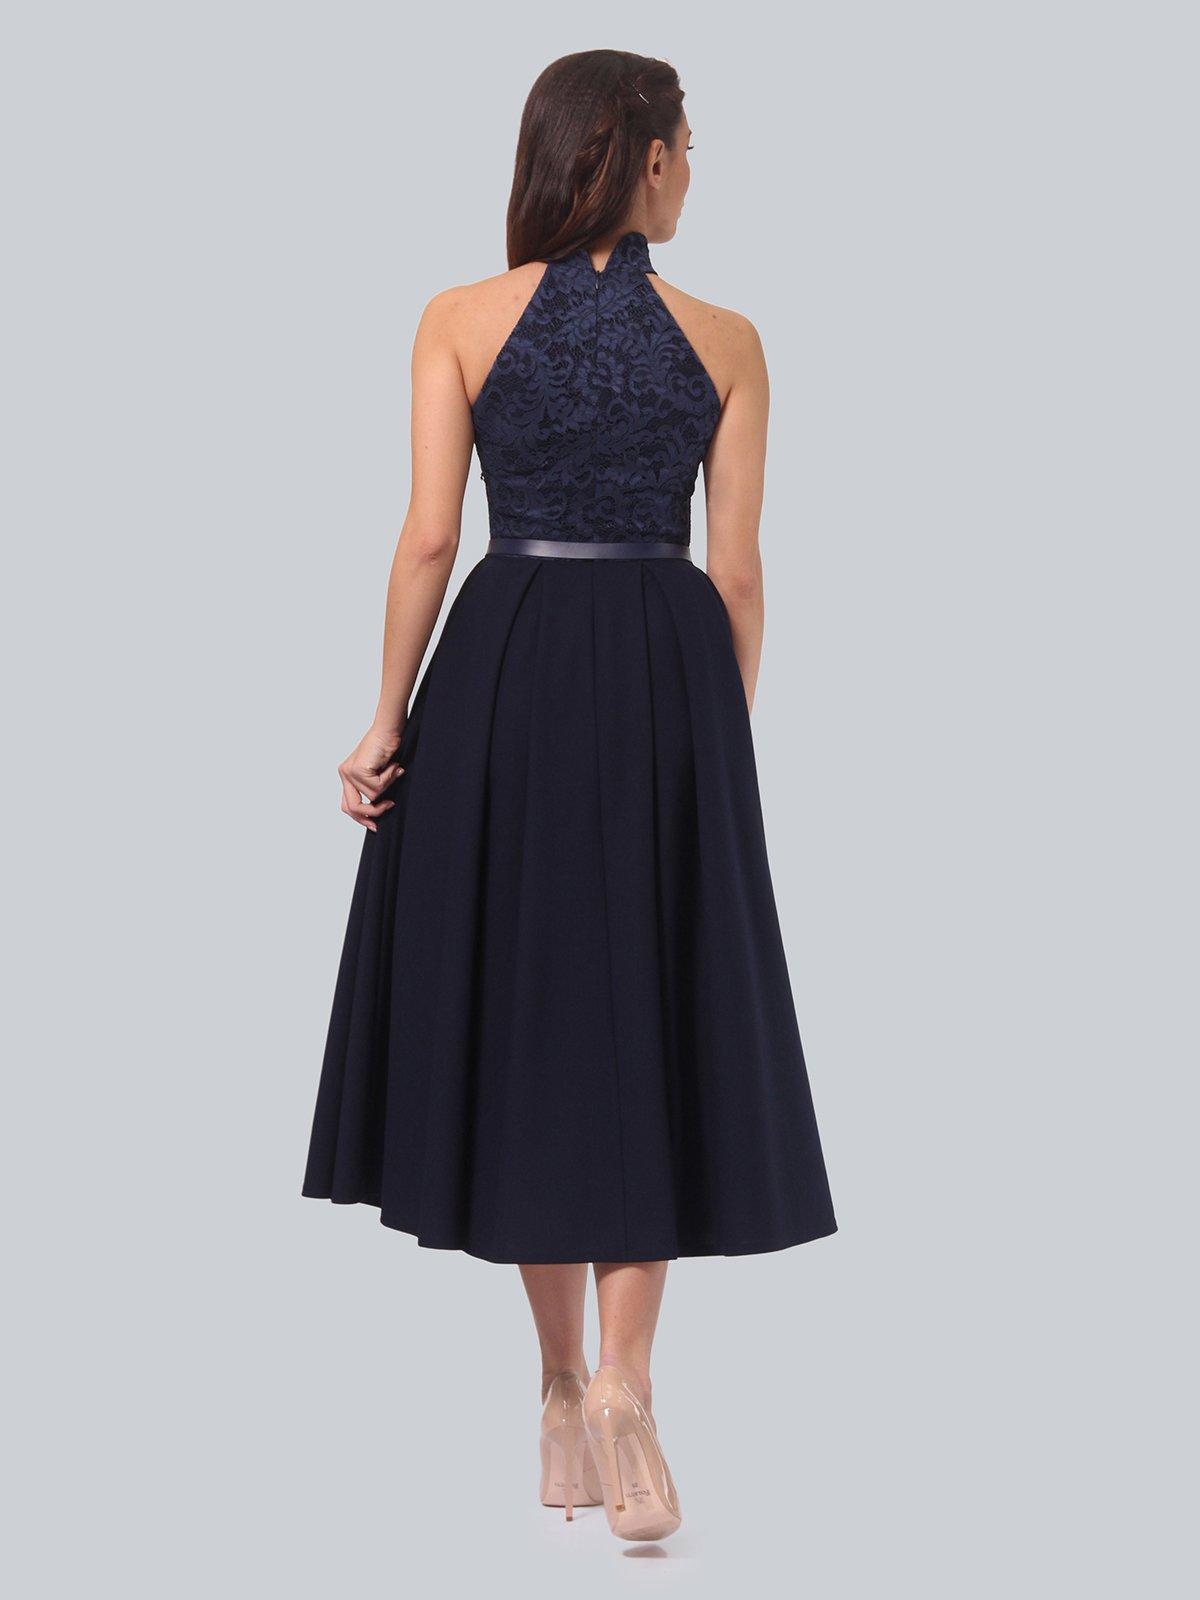 Платье темно-синее | 3851913 | фото 4